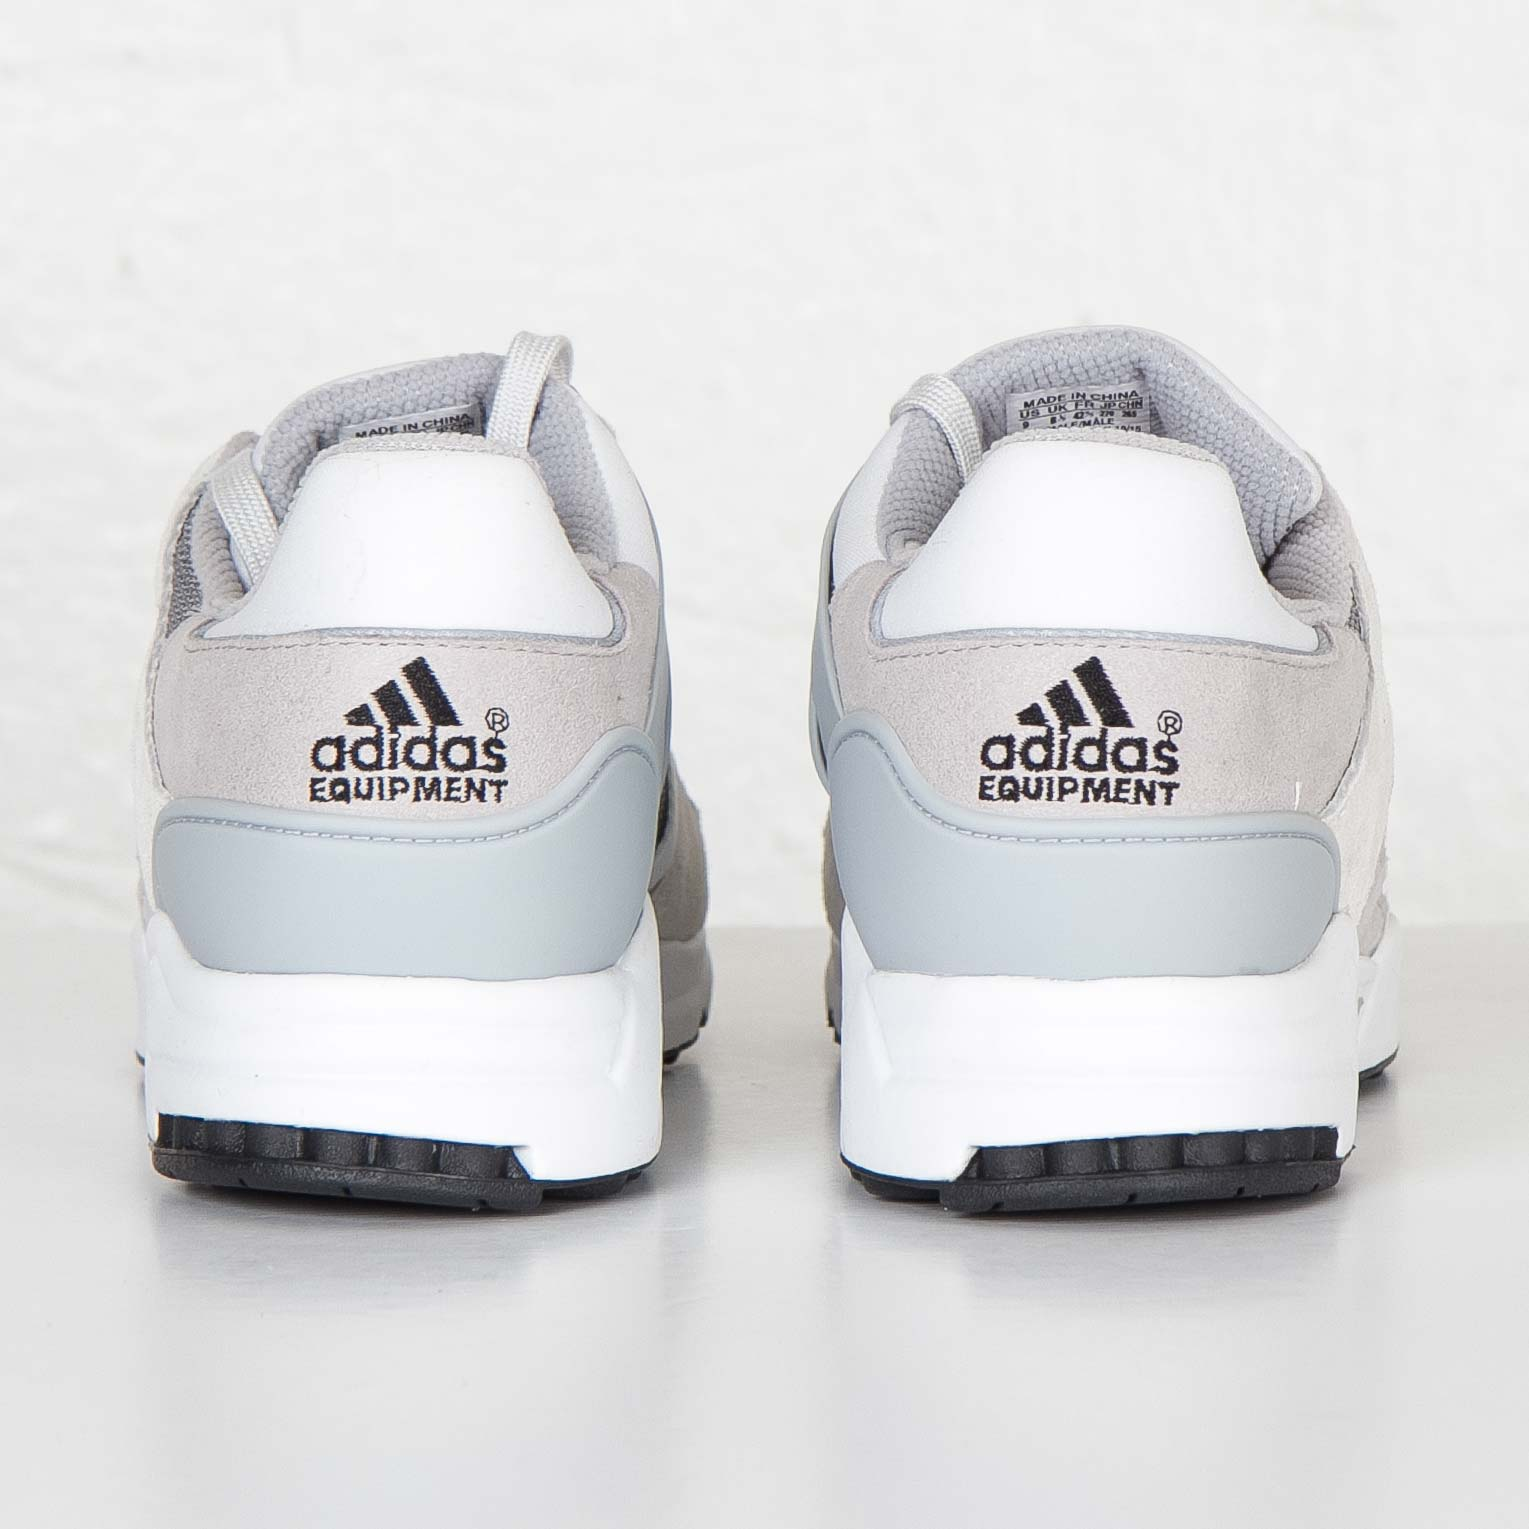 adidas Equipment Running Support S79128 Sneakersnstuff I